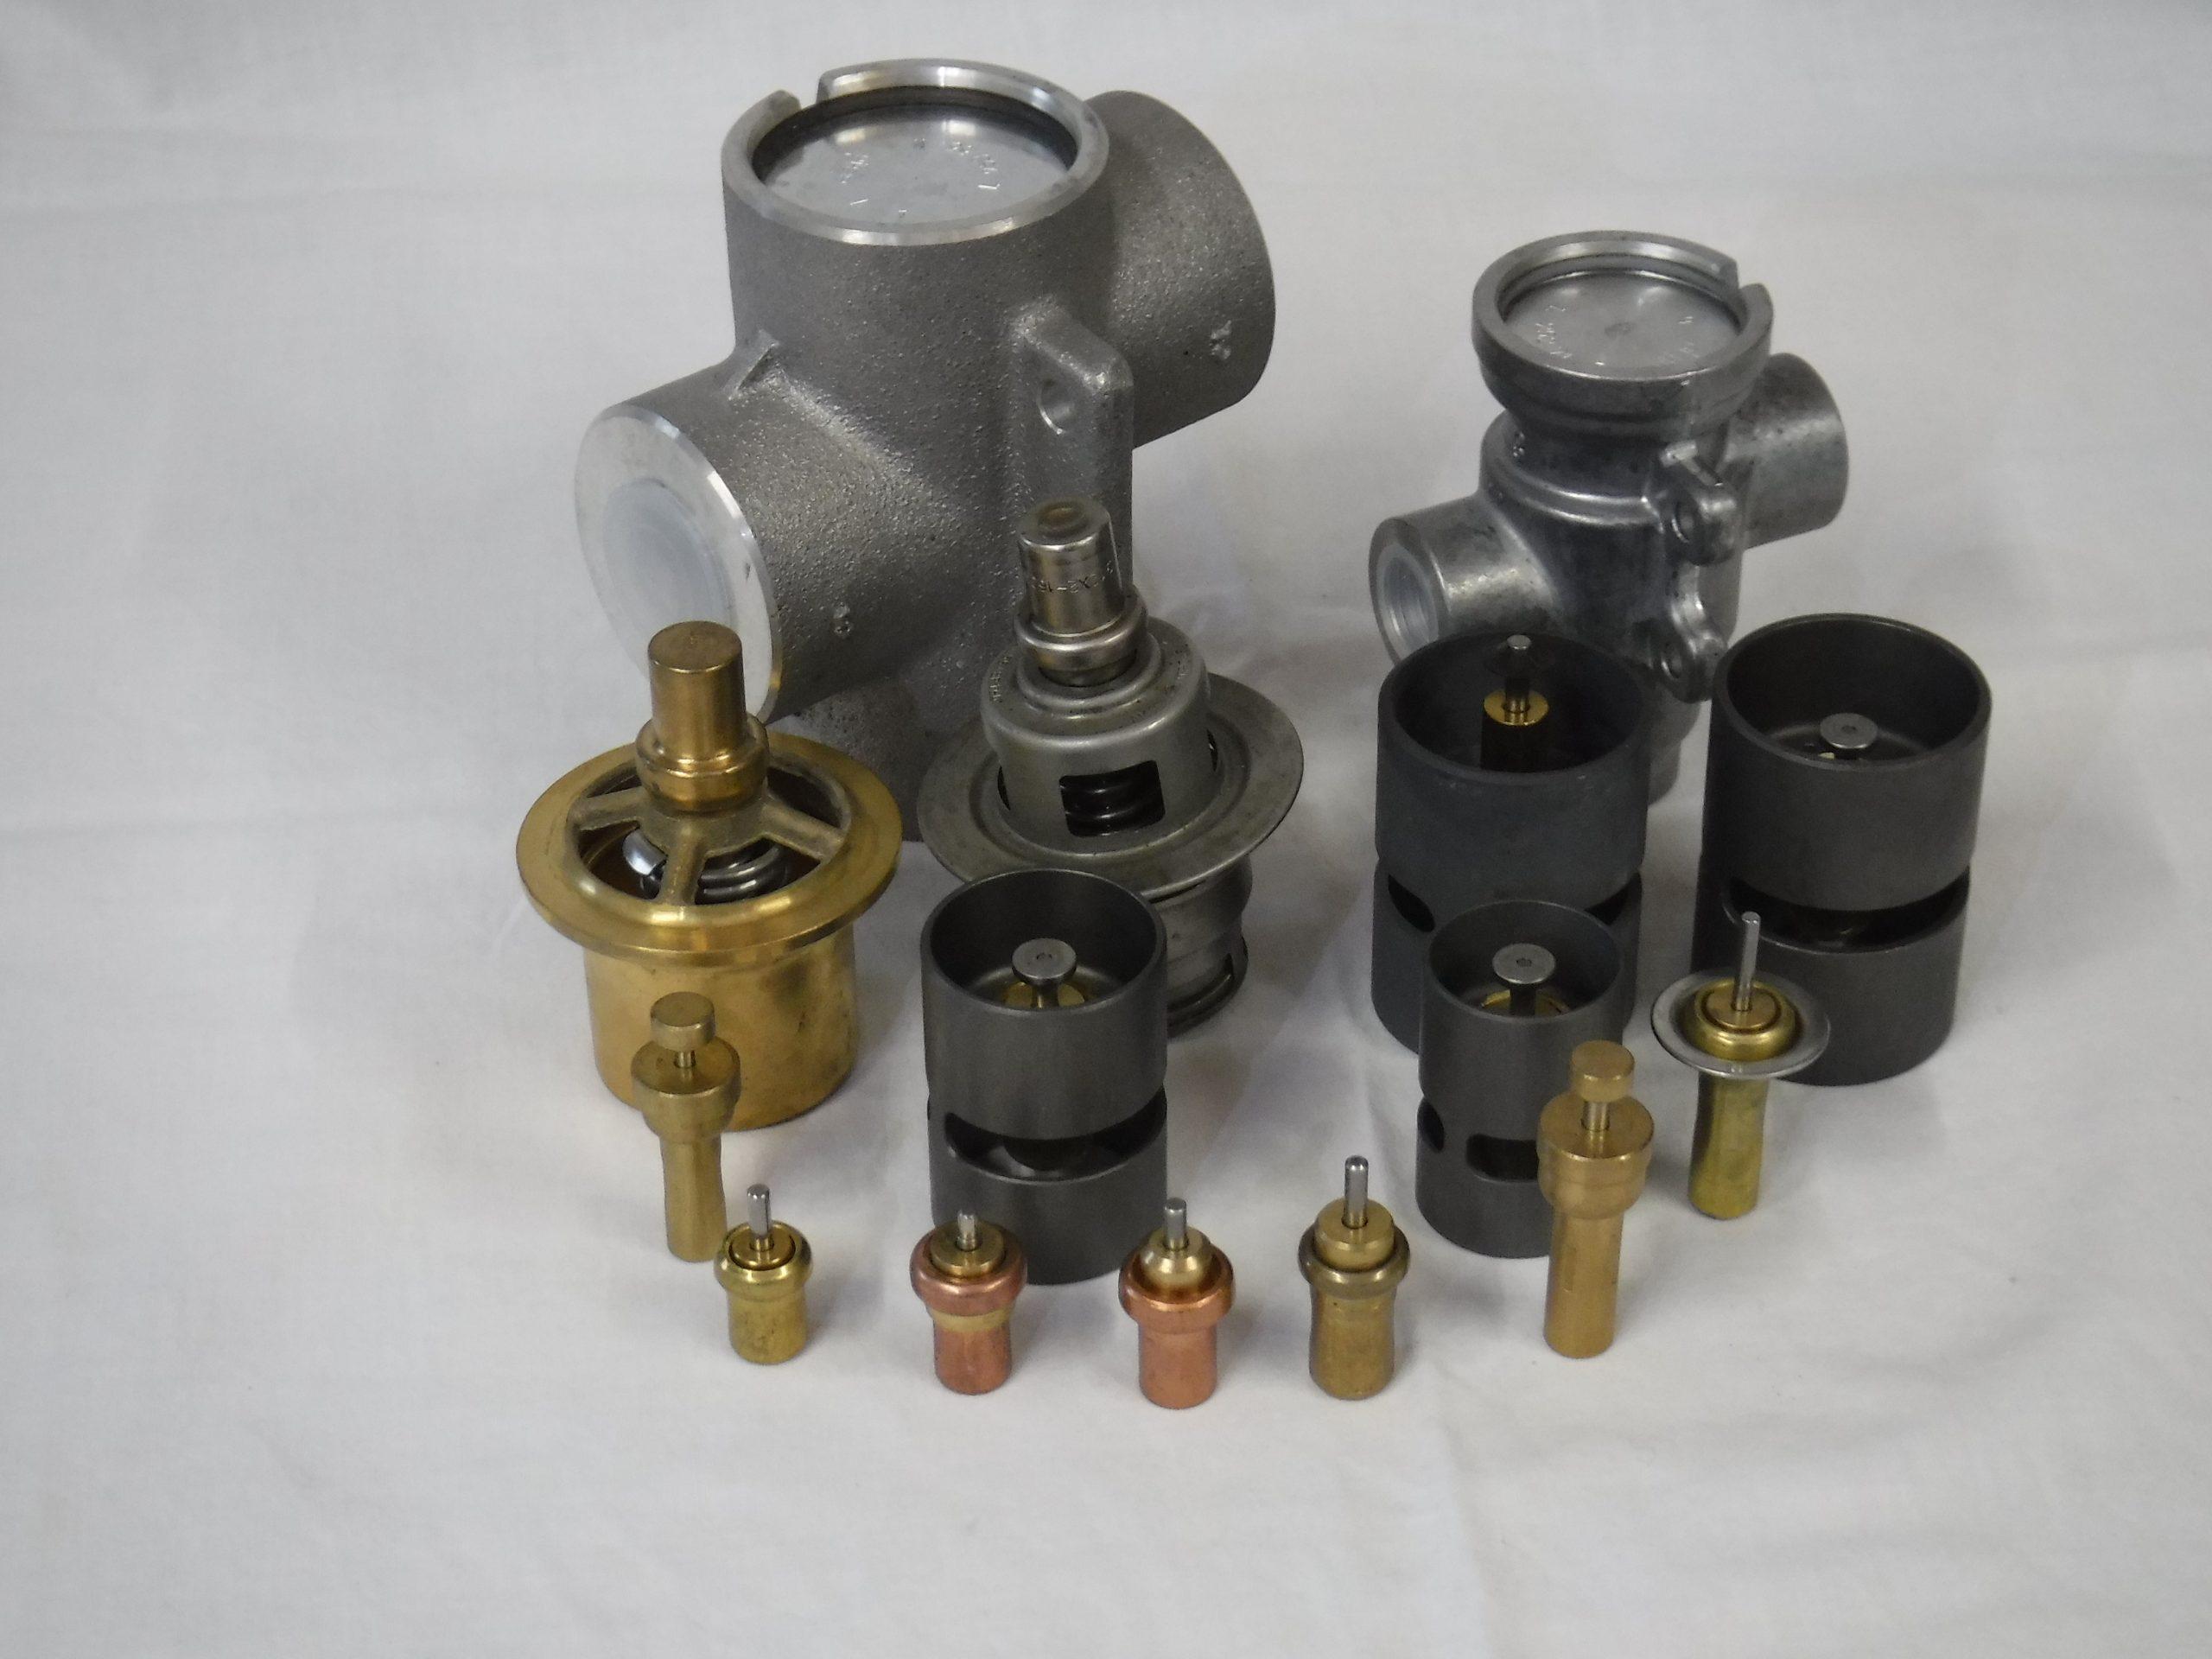 Oljni termostatski ventil